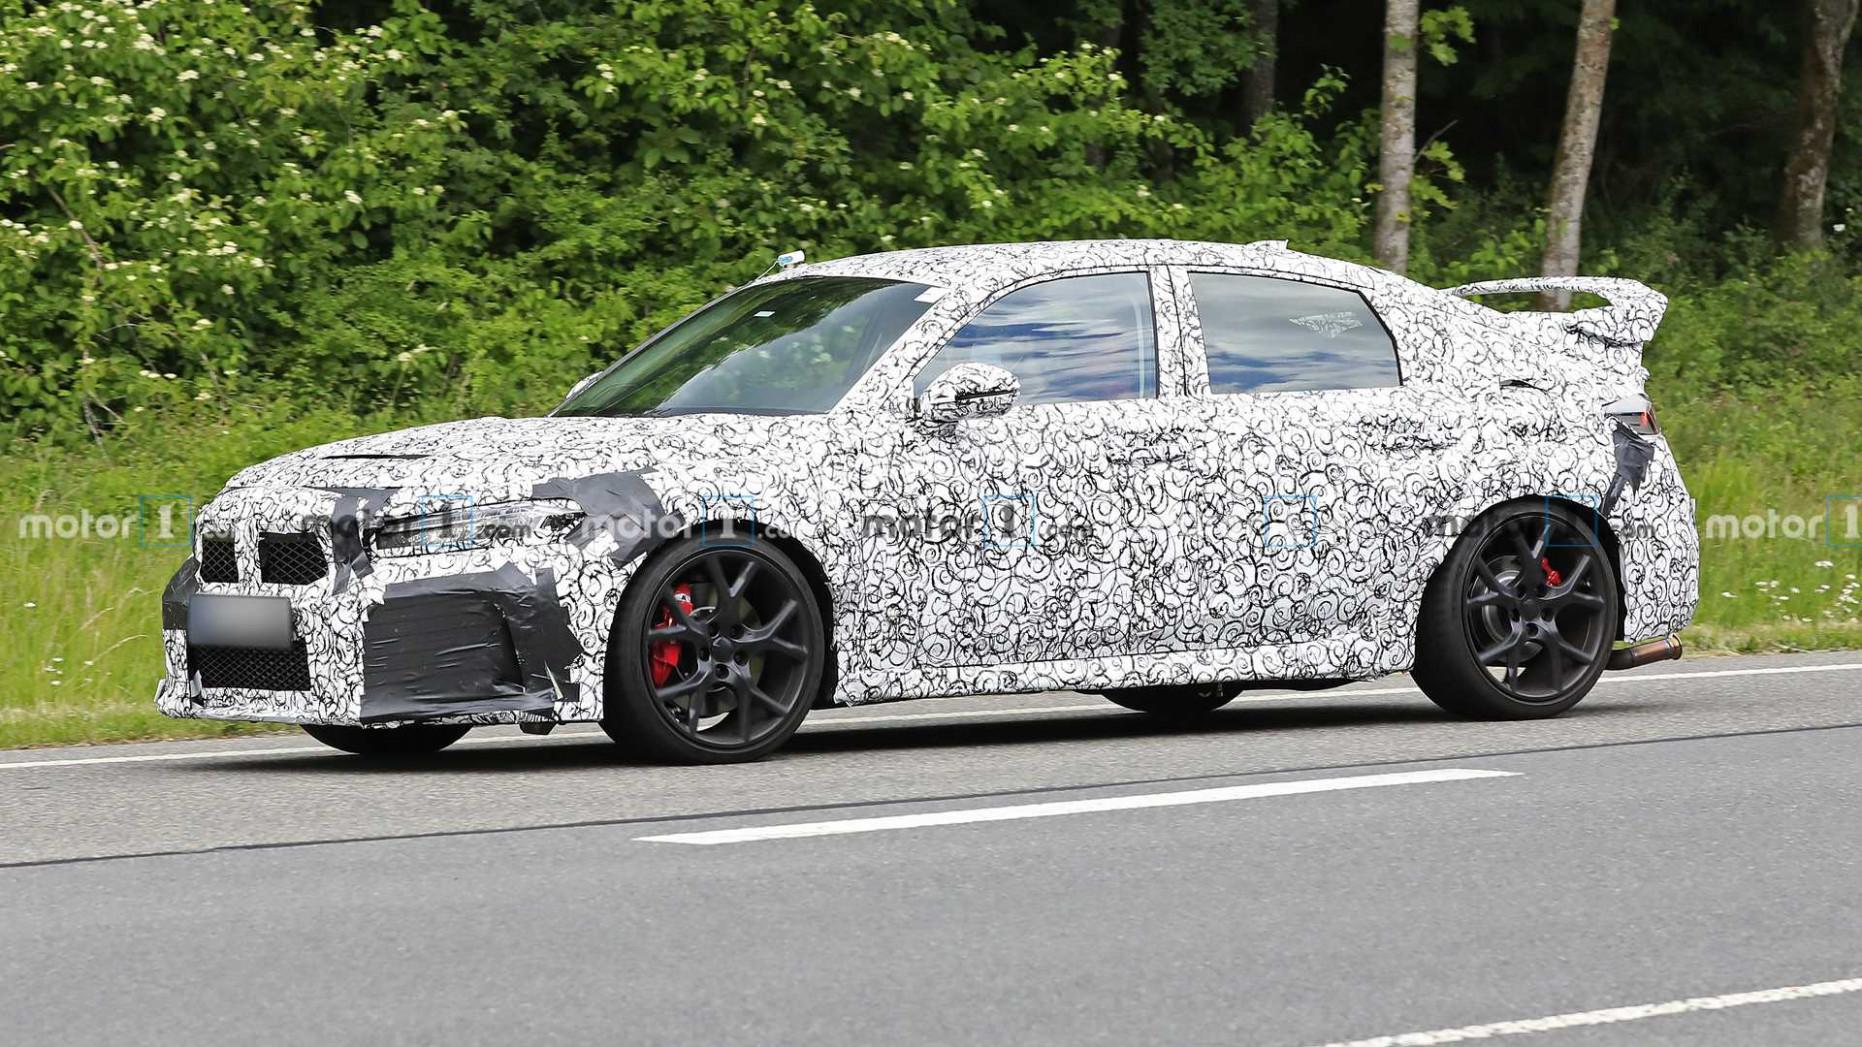 New Concept 2022 Honda Civic Type R